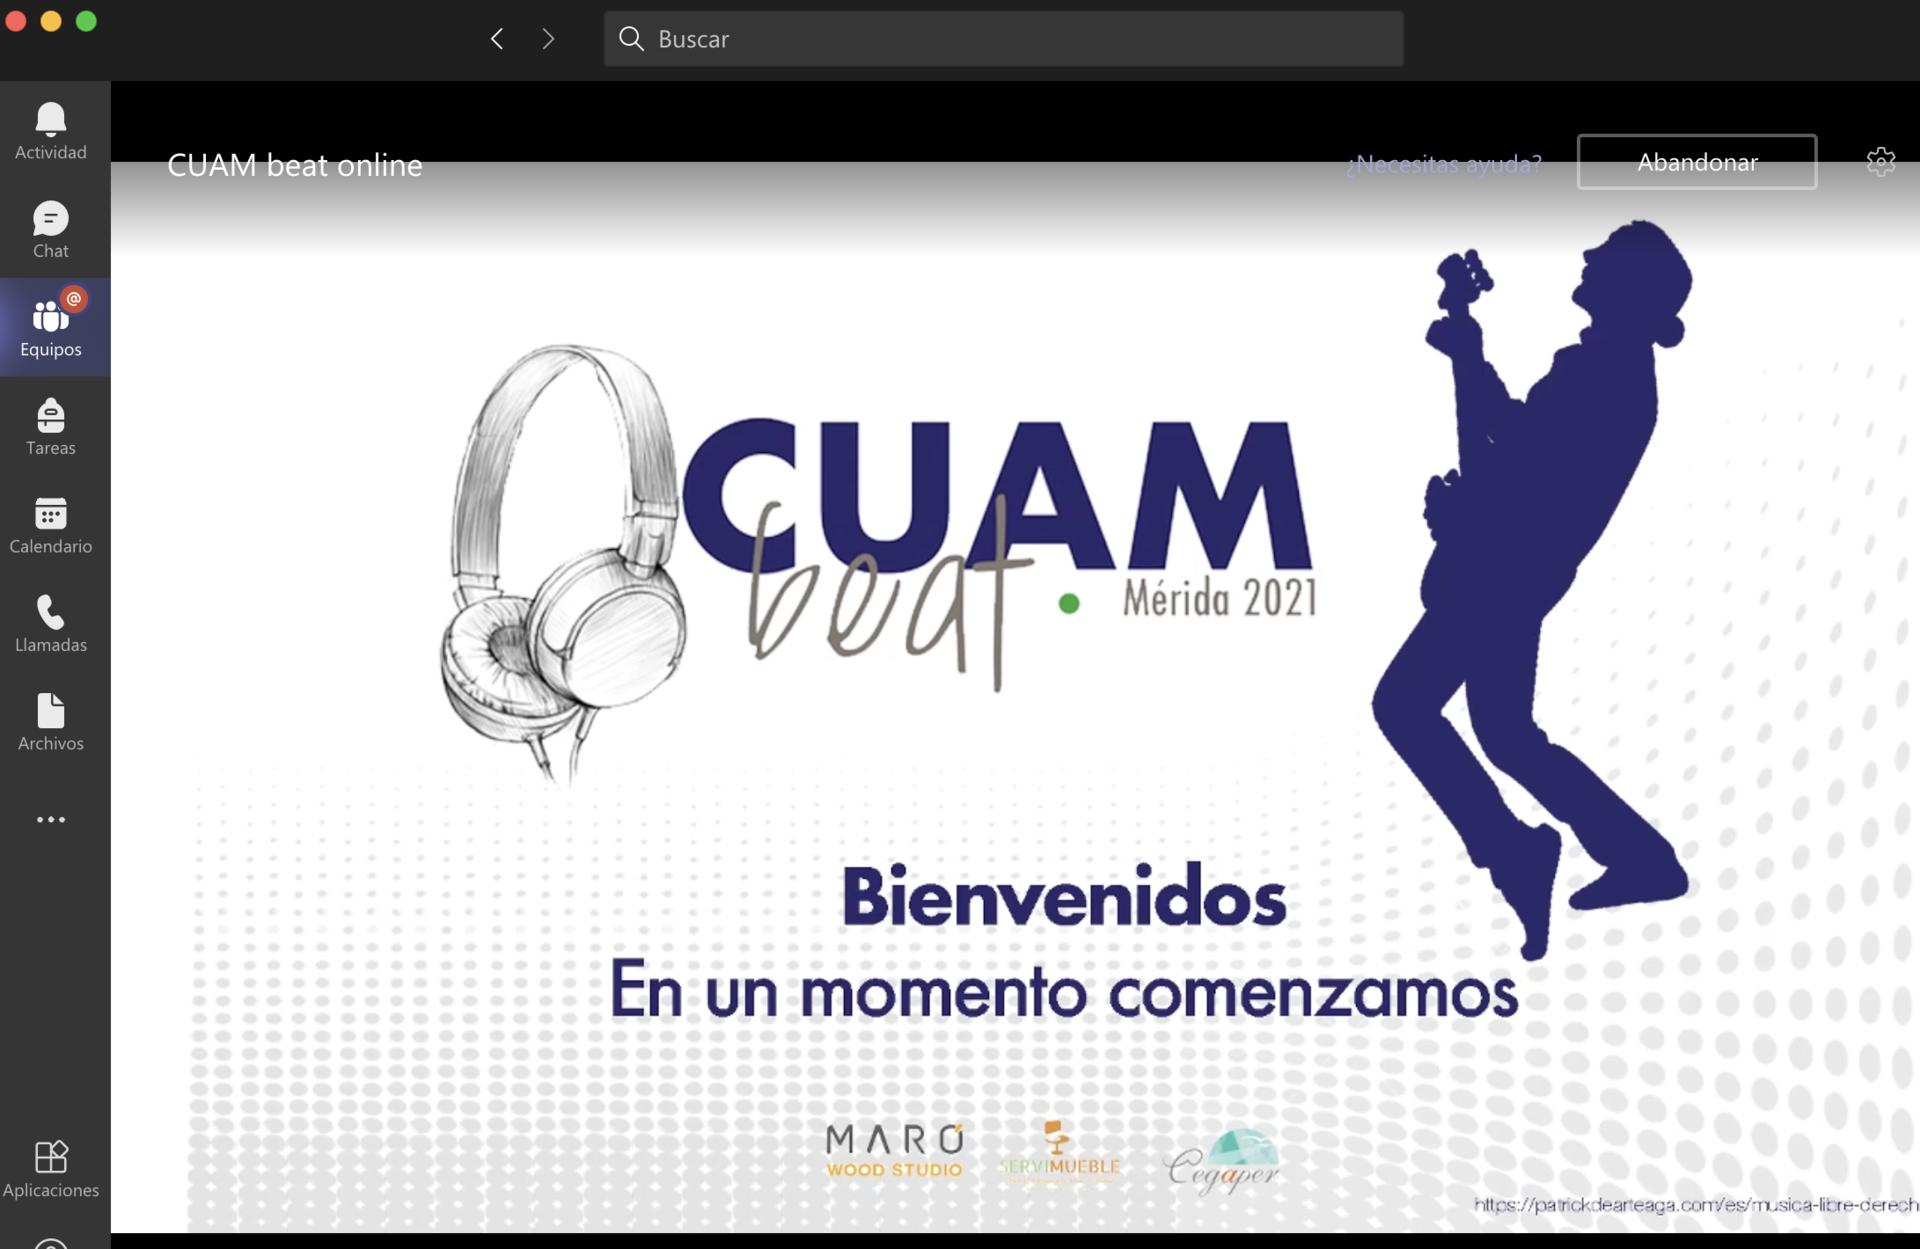 CUAM Beat Mérida 2021